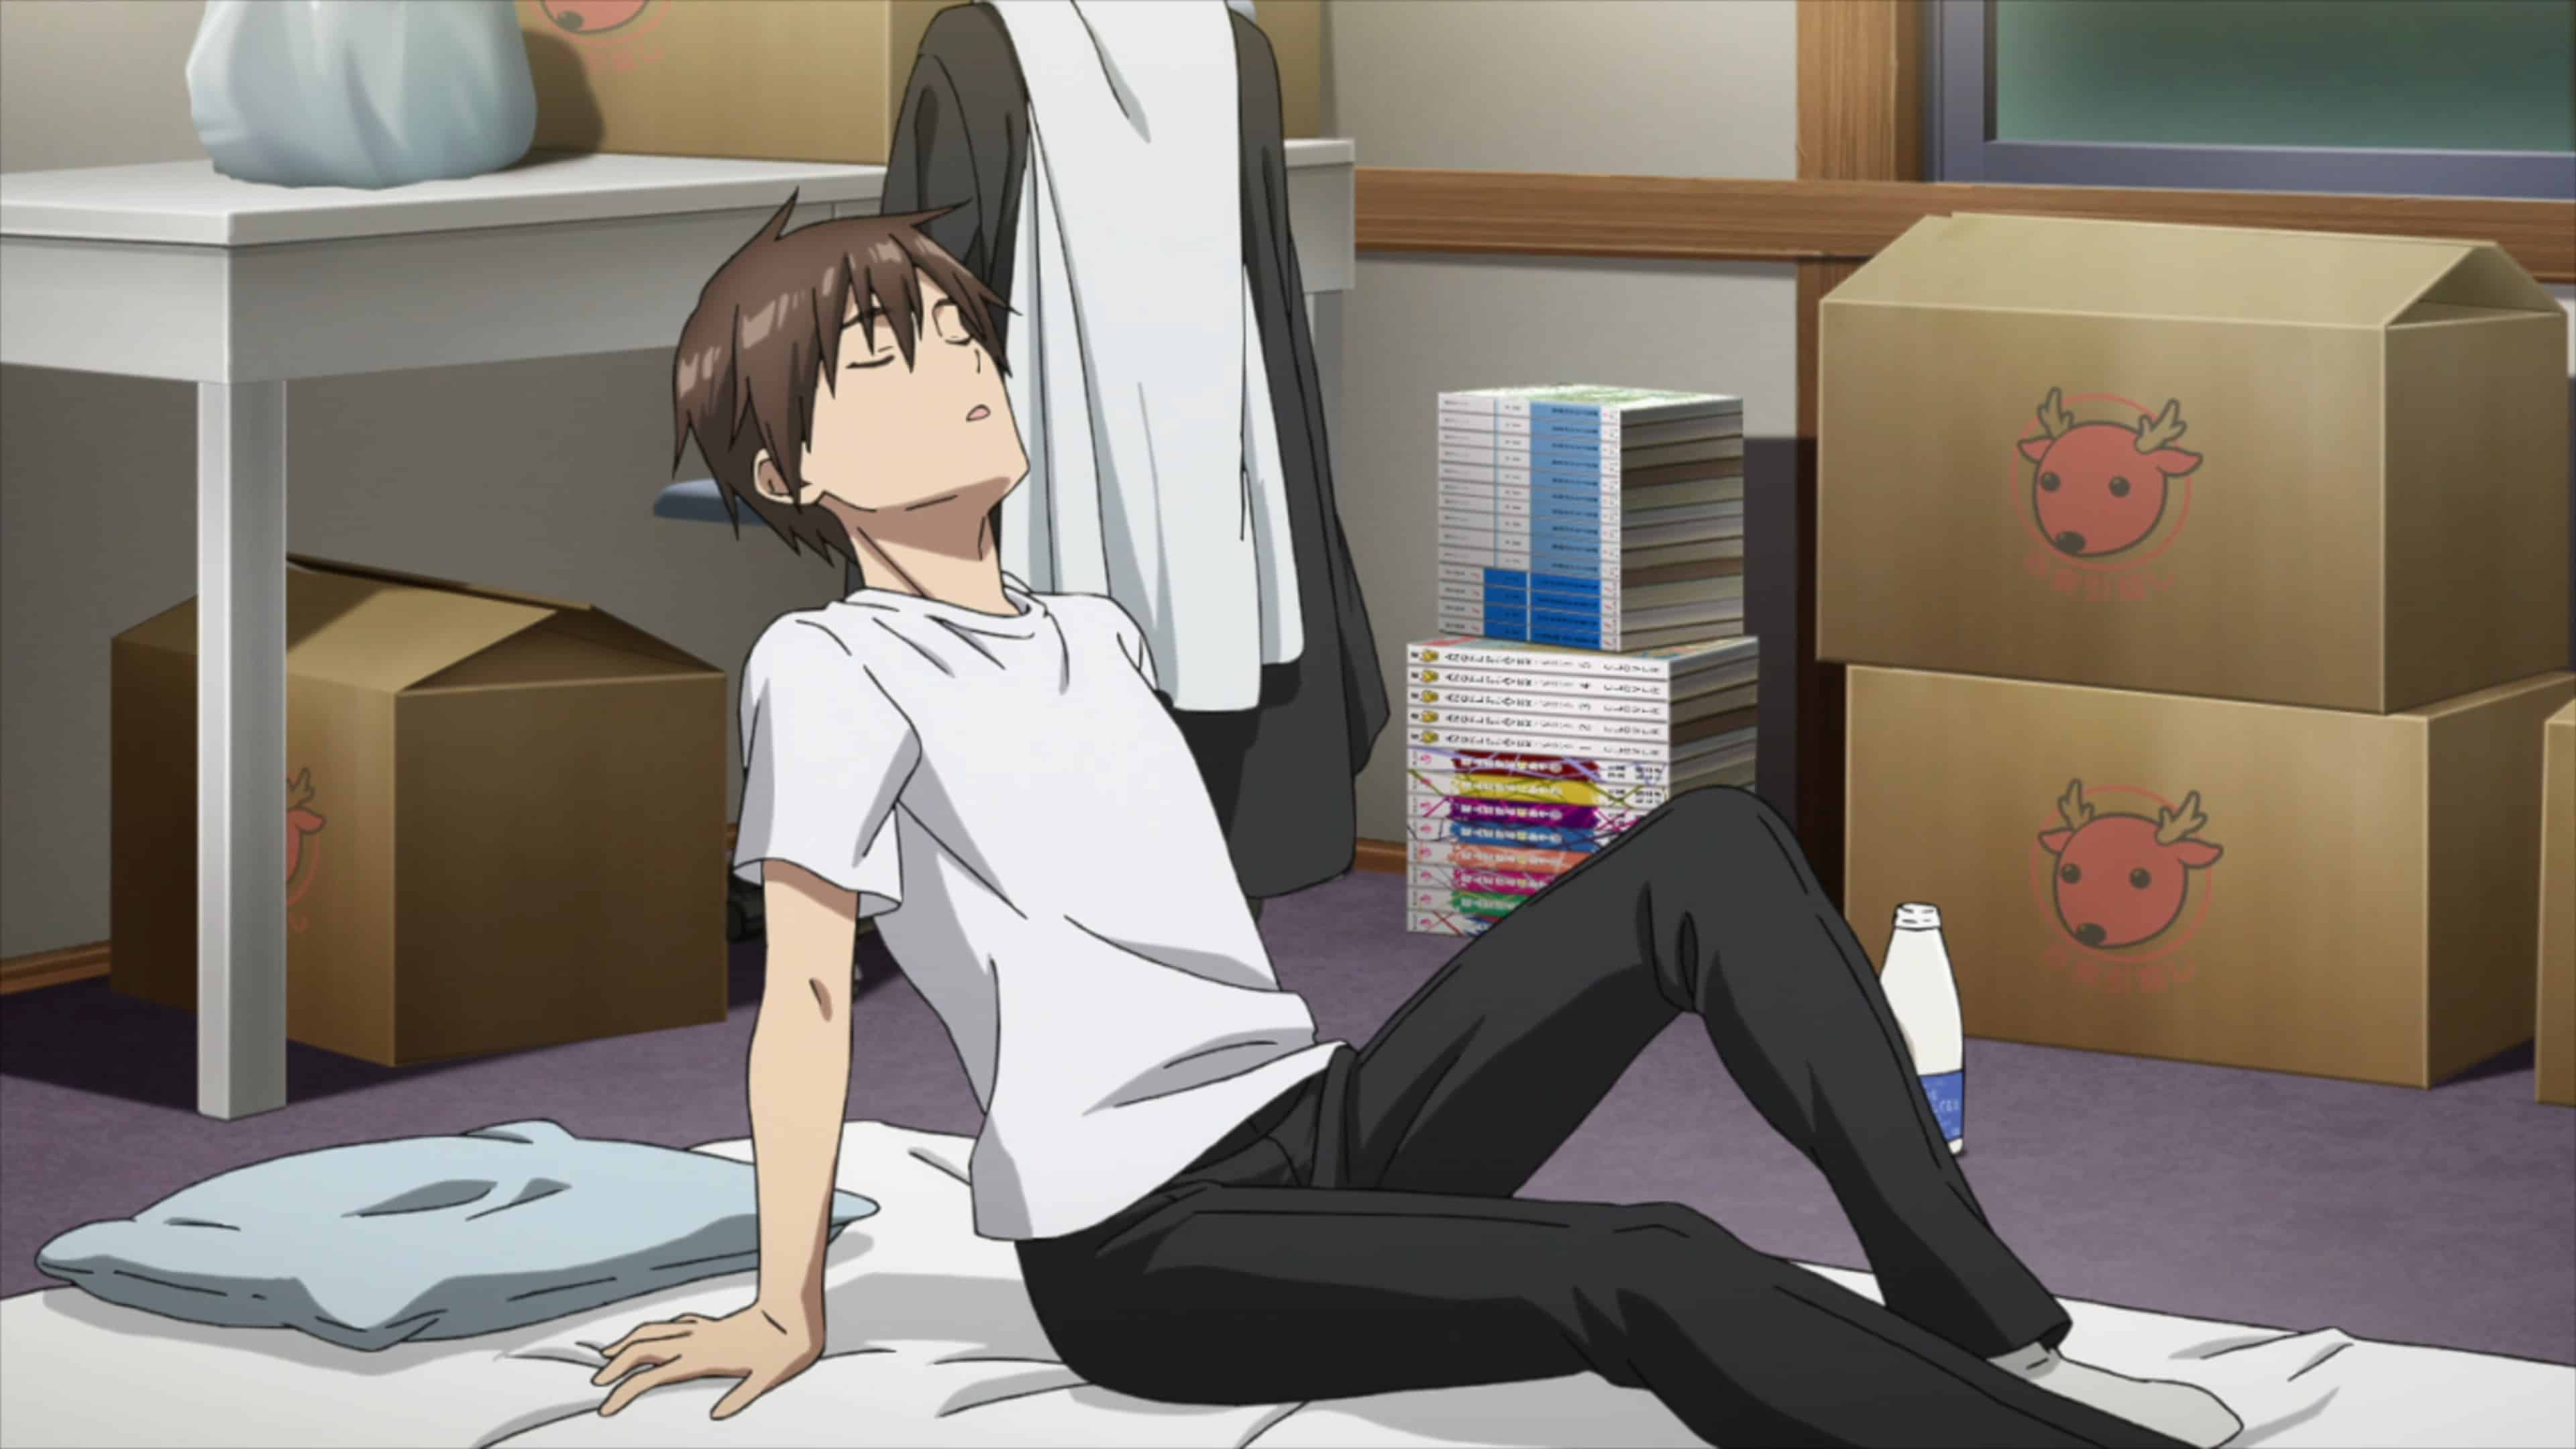 Kyoya (Masahiro Itou) before going to bed.